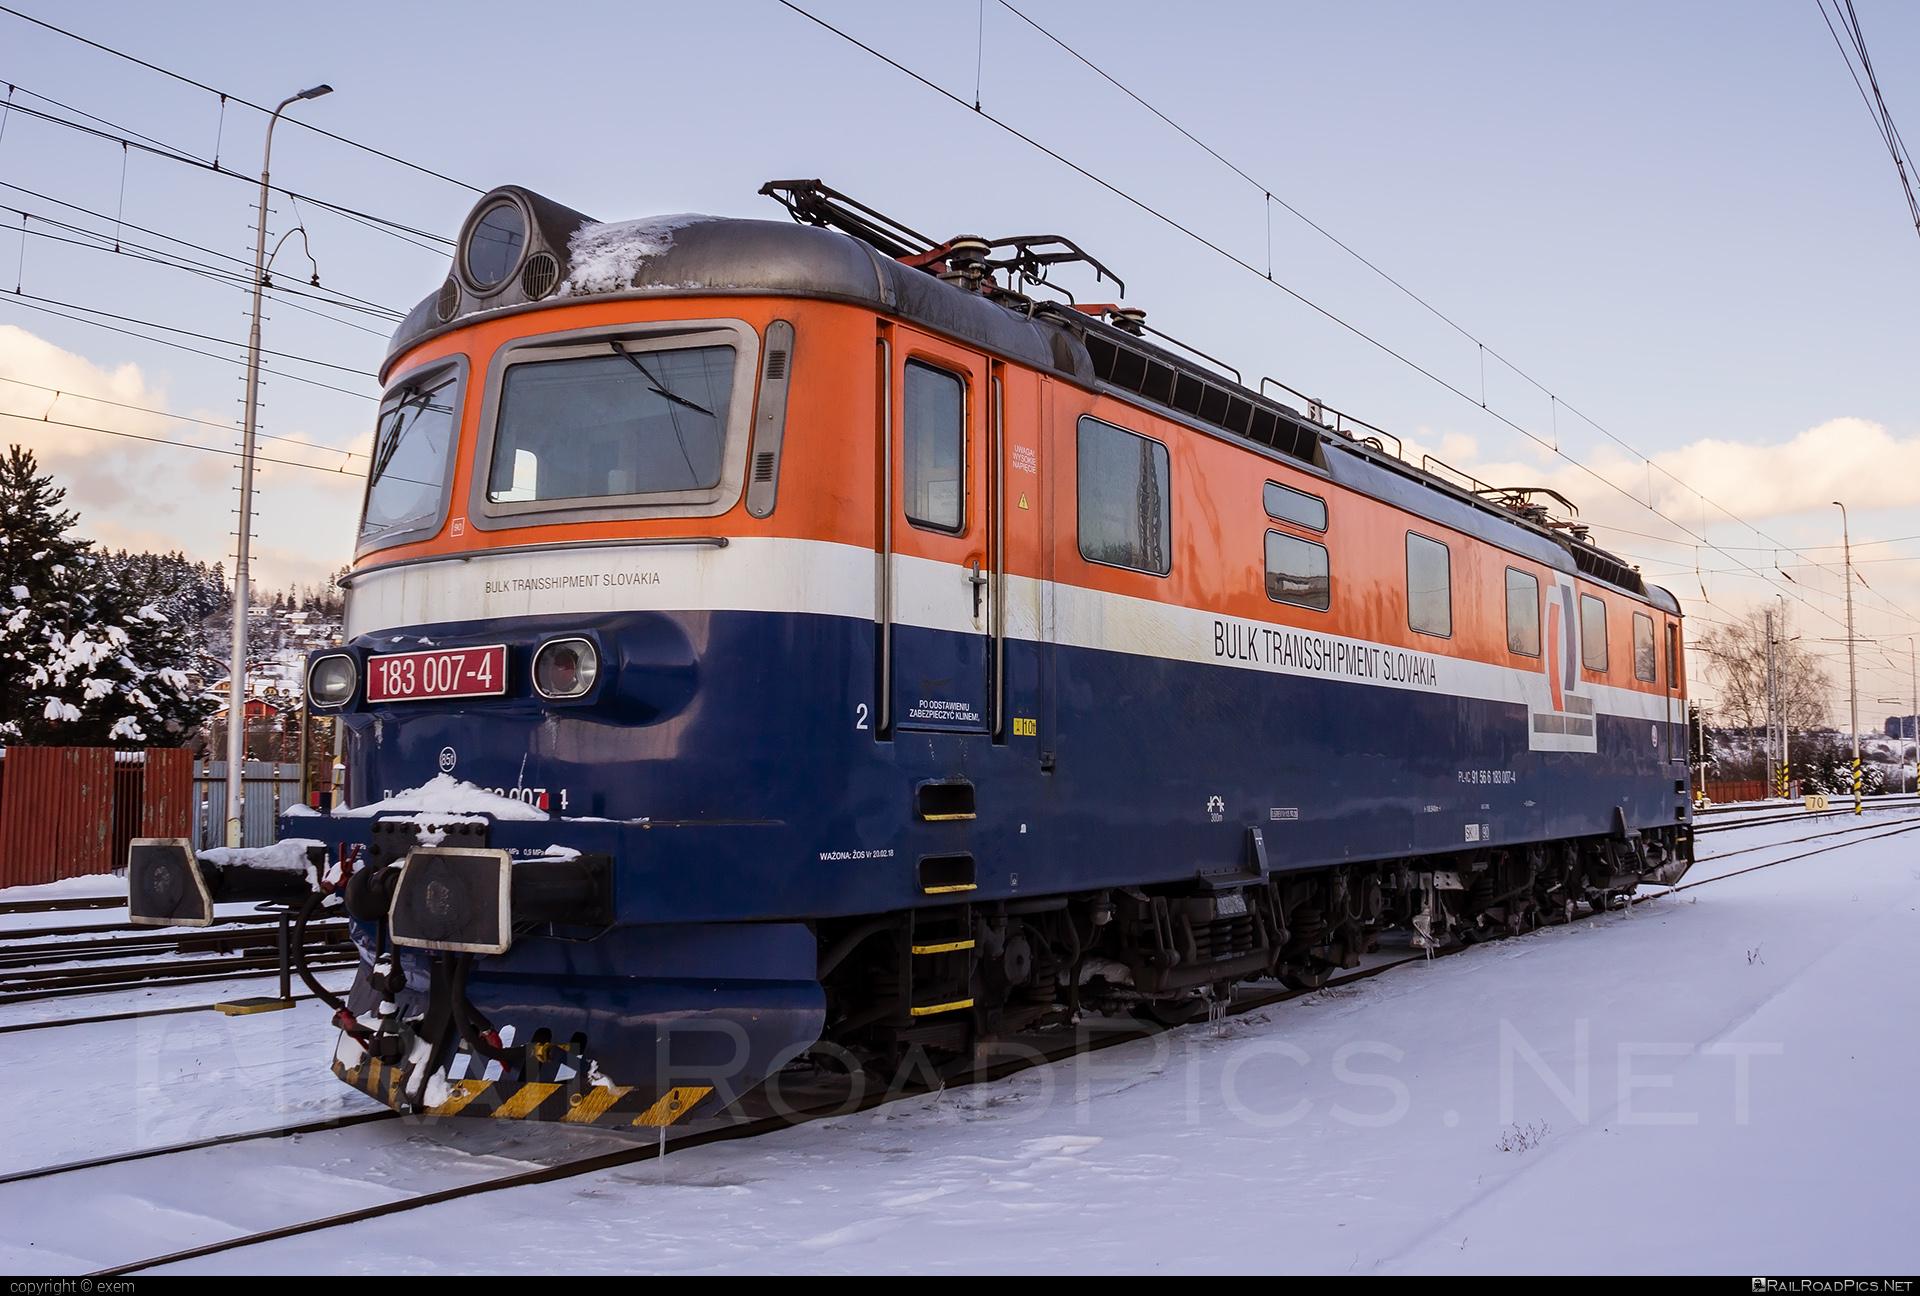 Škoda 61E - 183 007-4 operated by LOKORAIL, a.s. #intercargo #intercargospzoo #locomotive183 #lokorail #lrl #rakana #sestikolak #sestikolo #skoda #skoda61e